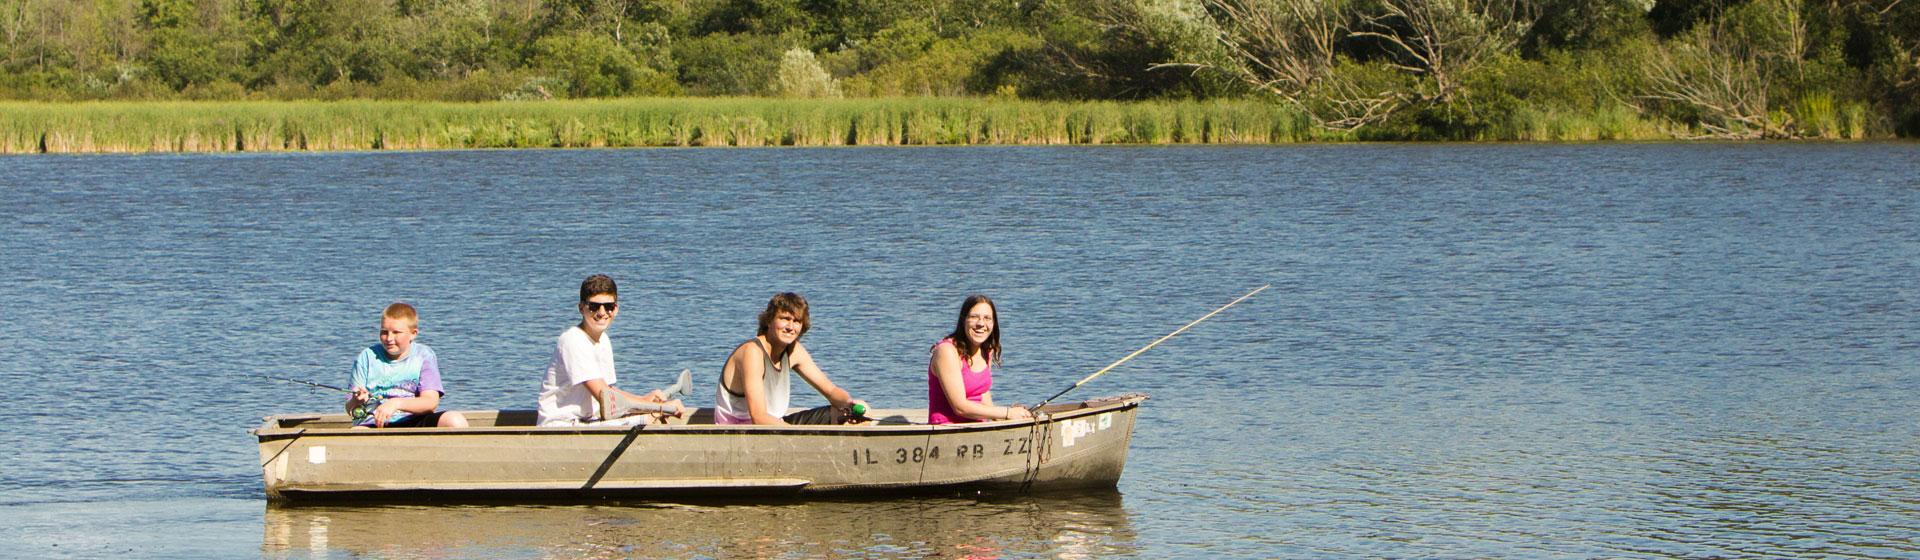 Camping lake campground overnight rental for Fish lake camping